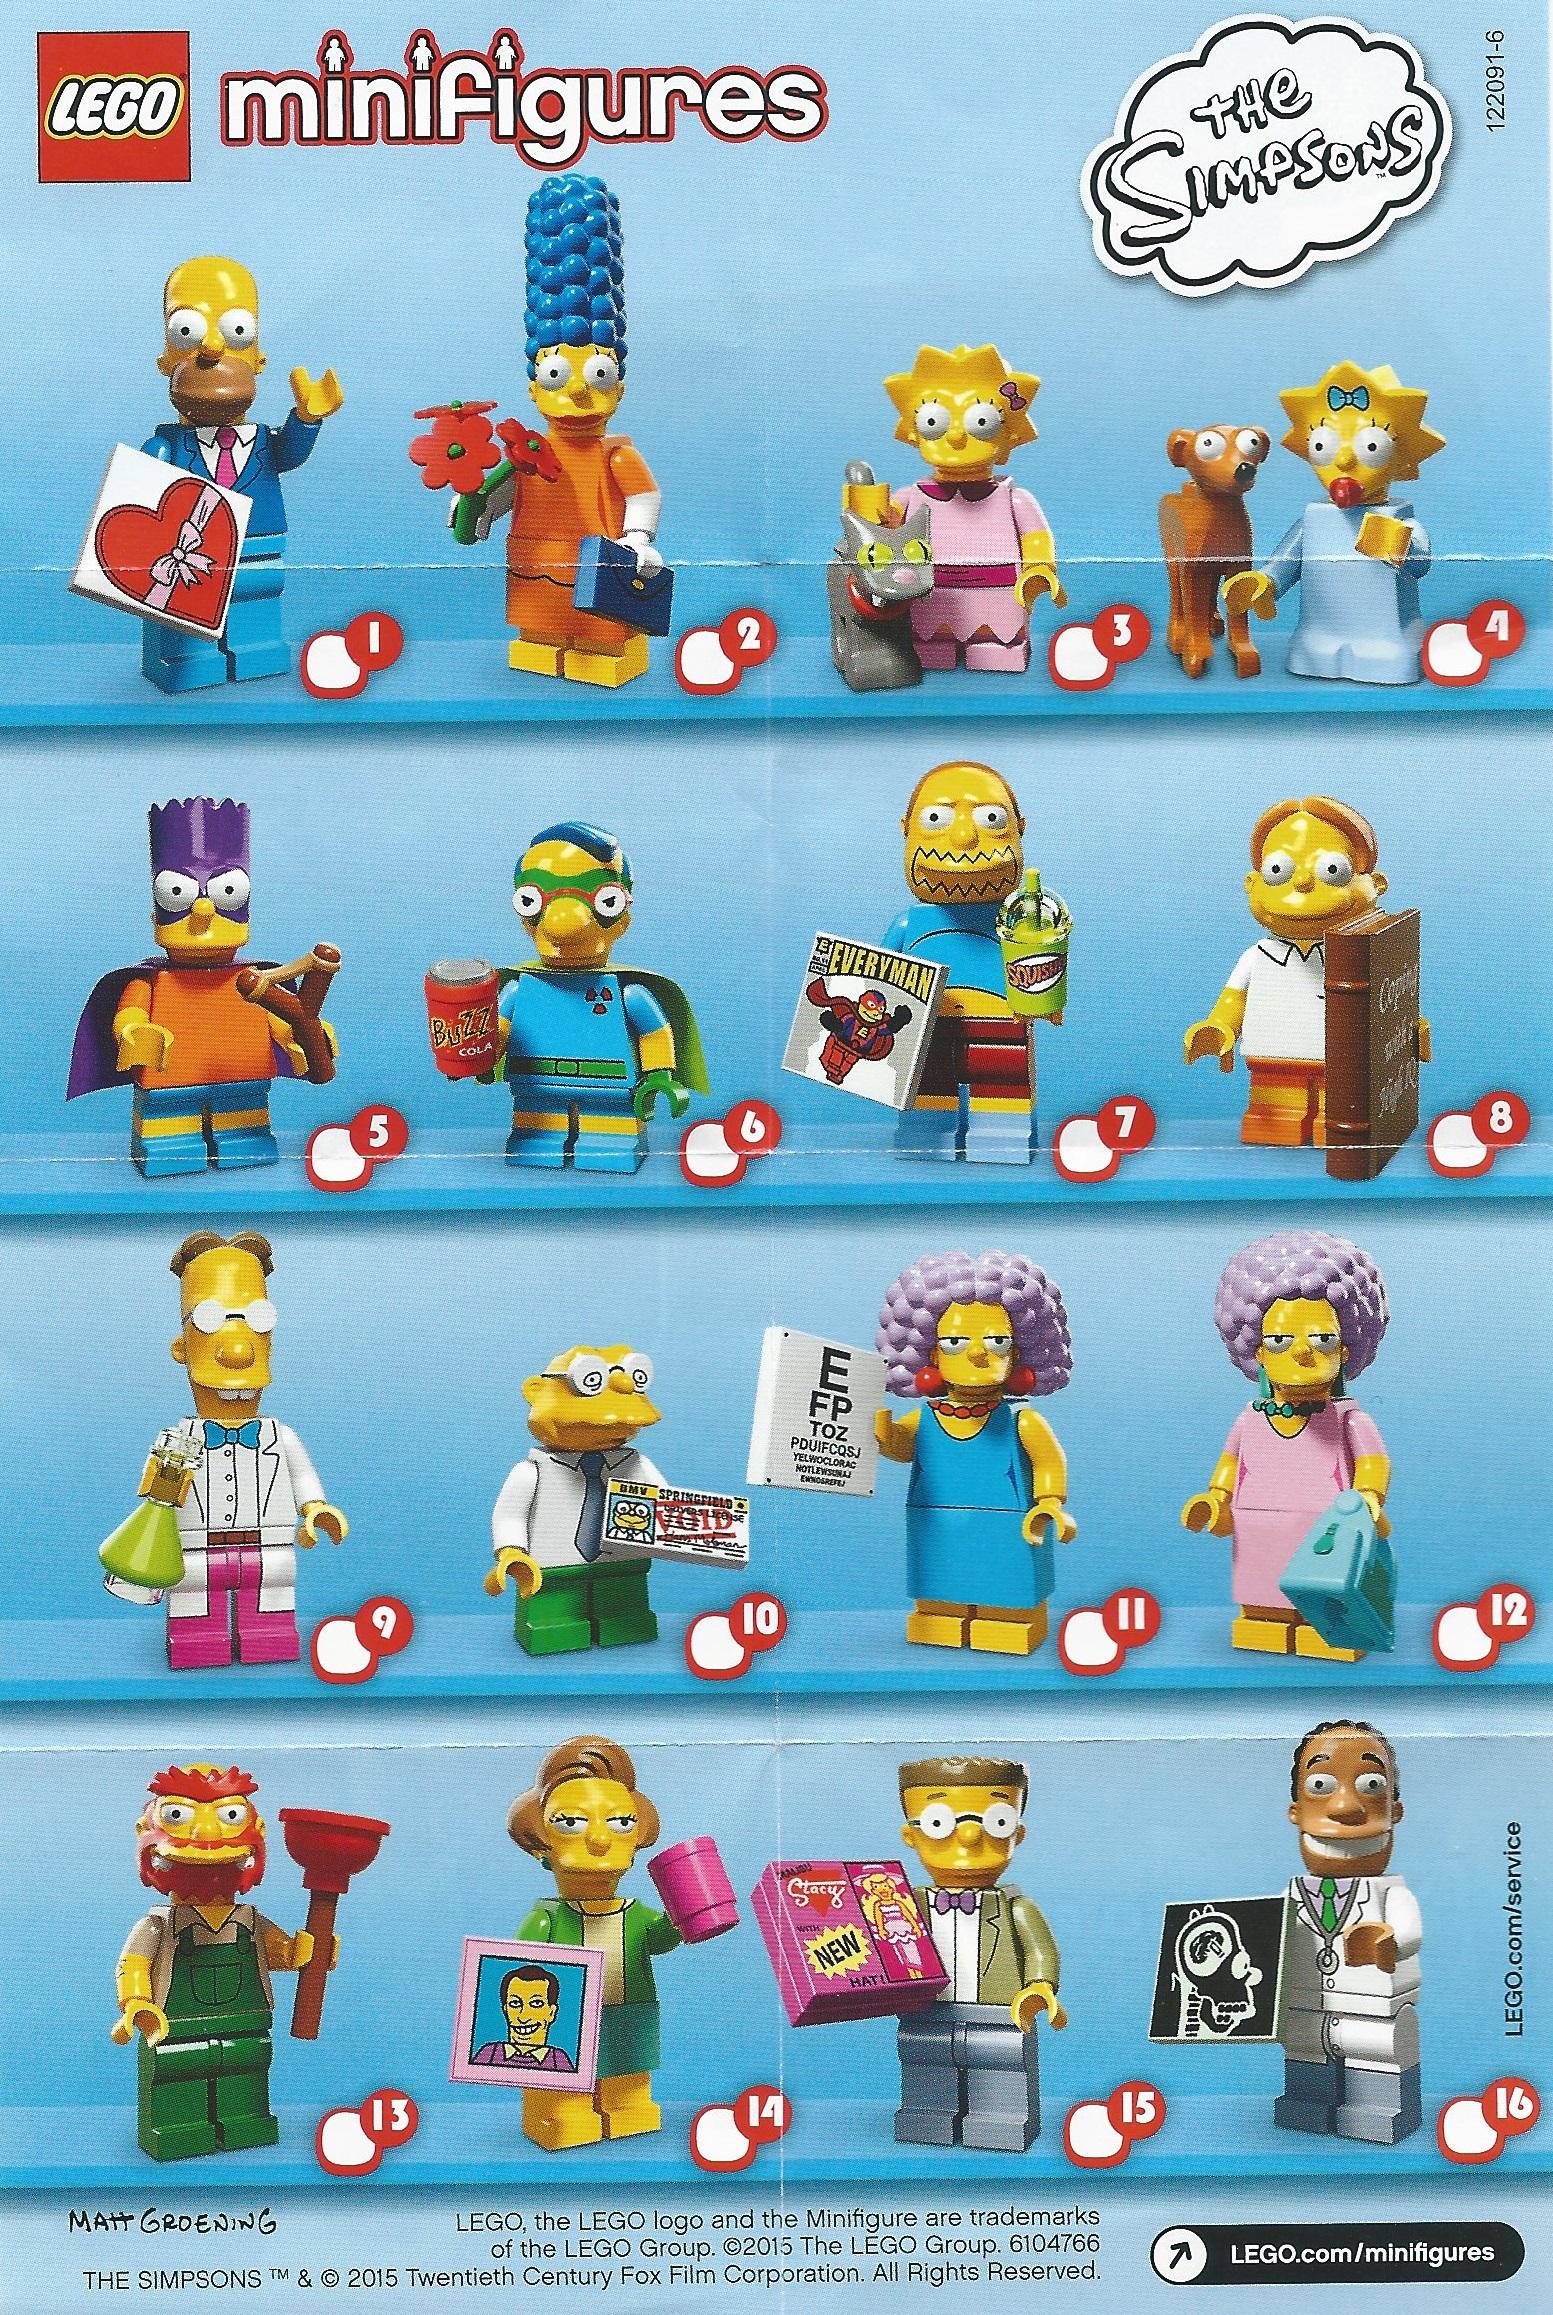 6 X LEGO LOT OF SQUISHEE SLURPEE DRINK SODA CUP MINIFIGURE